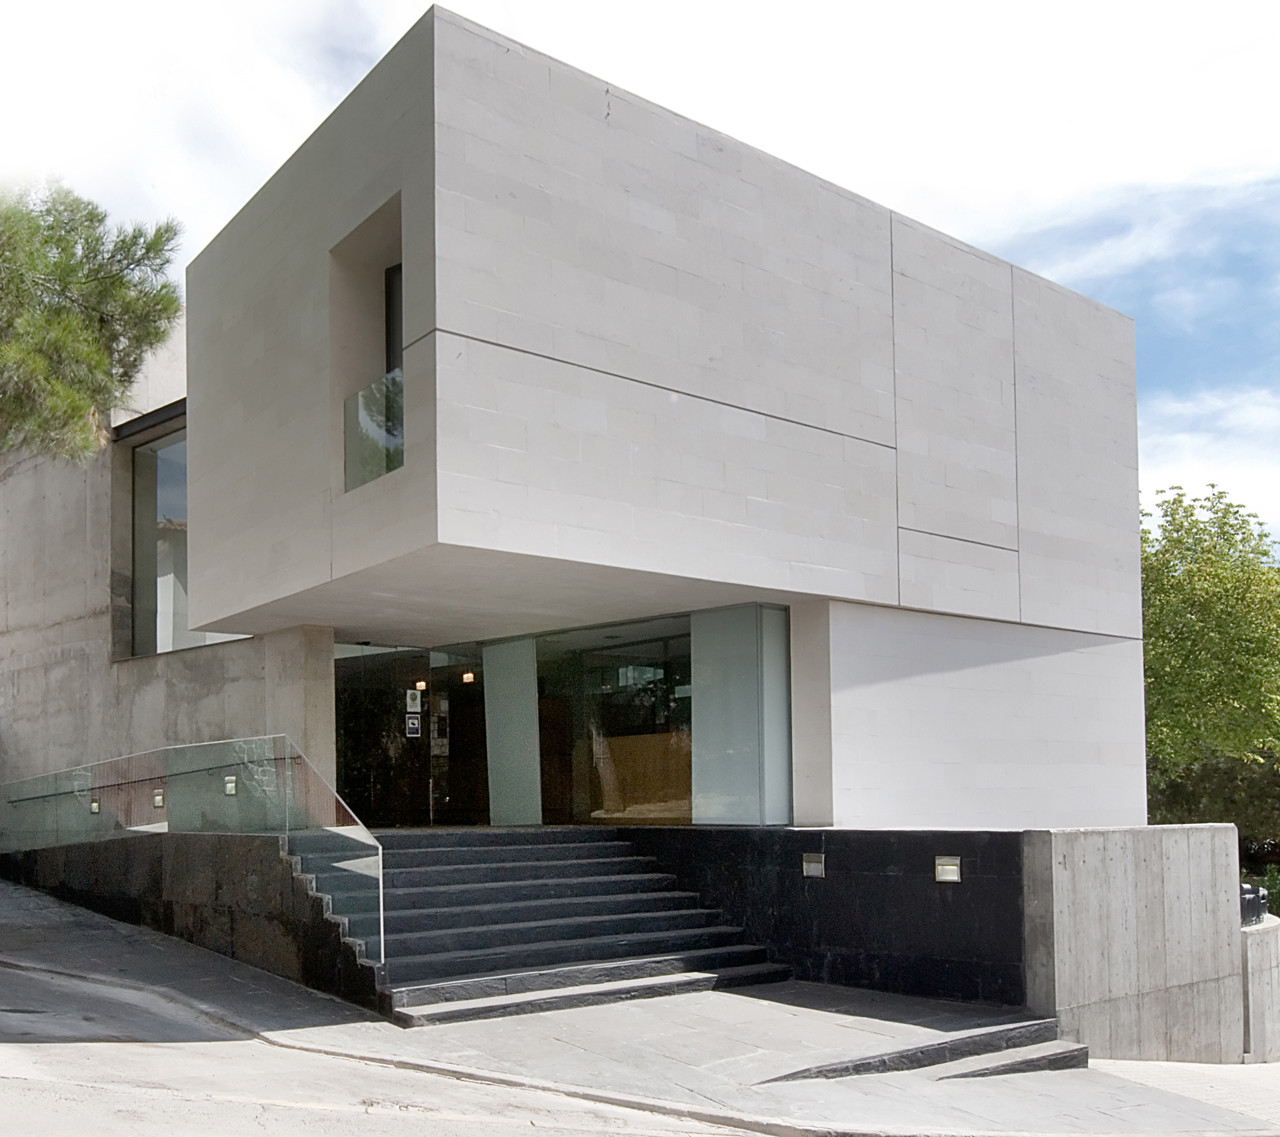 Civil Defense Center In Cobeña / GEA Arquitectos, © Ignacio Marqués